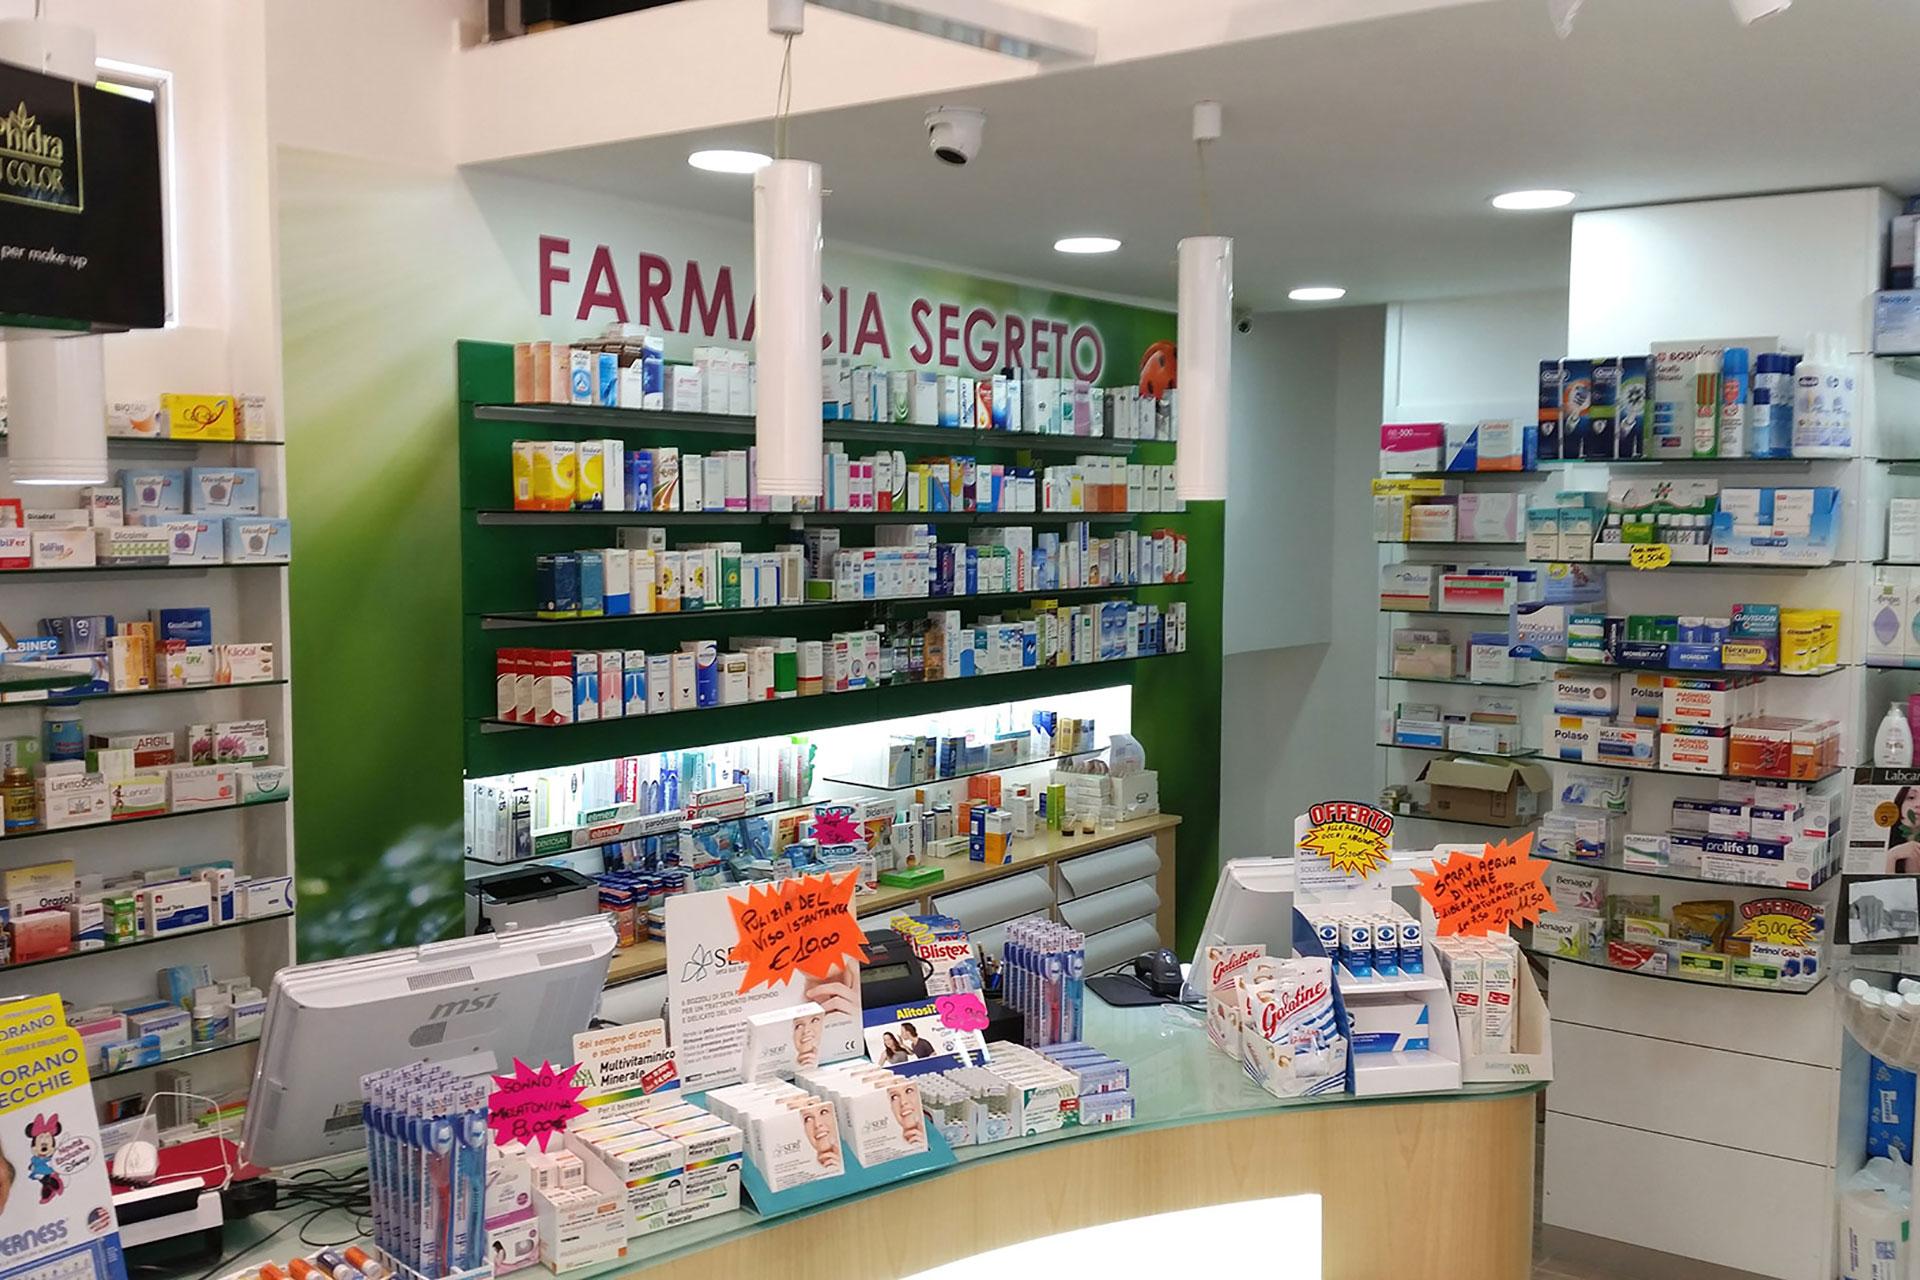 Farmacia Segreto dott. Francesco - Napoli